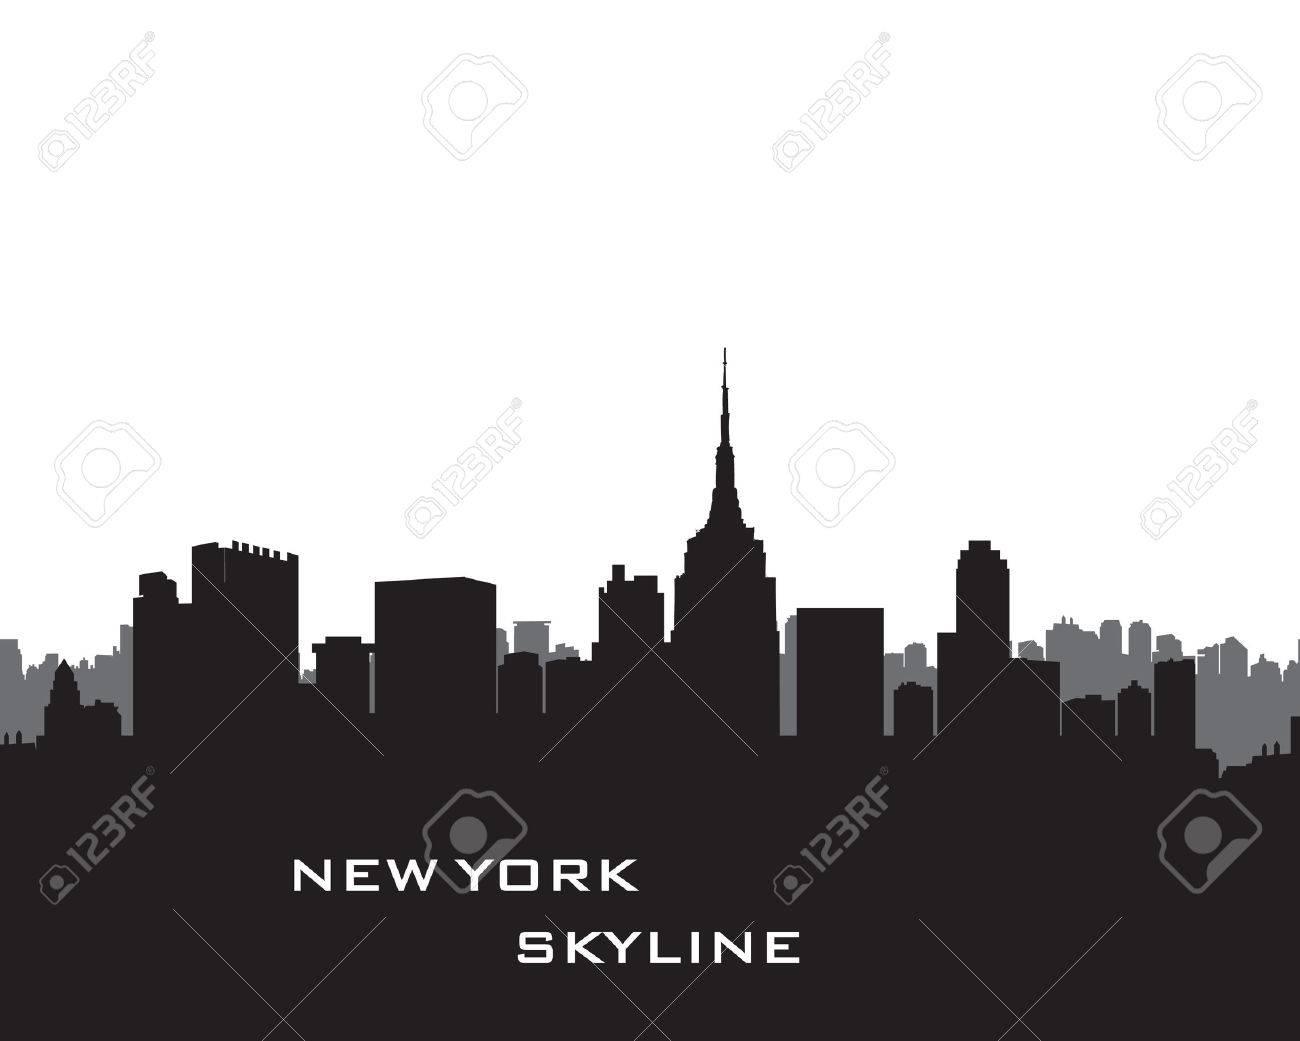 New York Skyline. Vector USA landscape. Cityscape with skyscrapers. City silhouette. Panorama city background. Skyline urban border. - 60824879